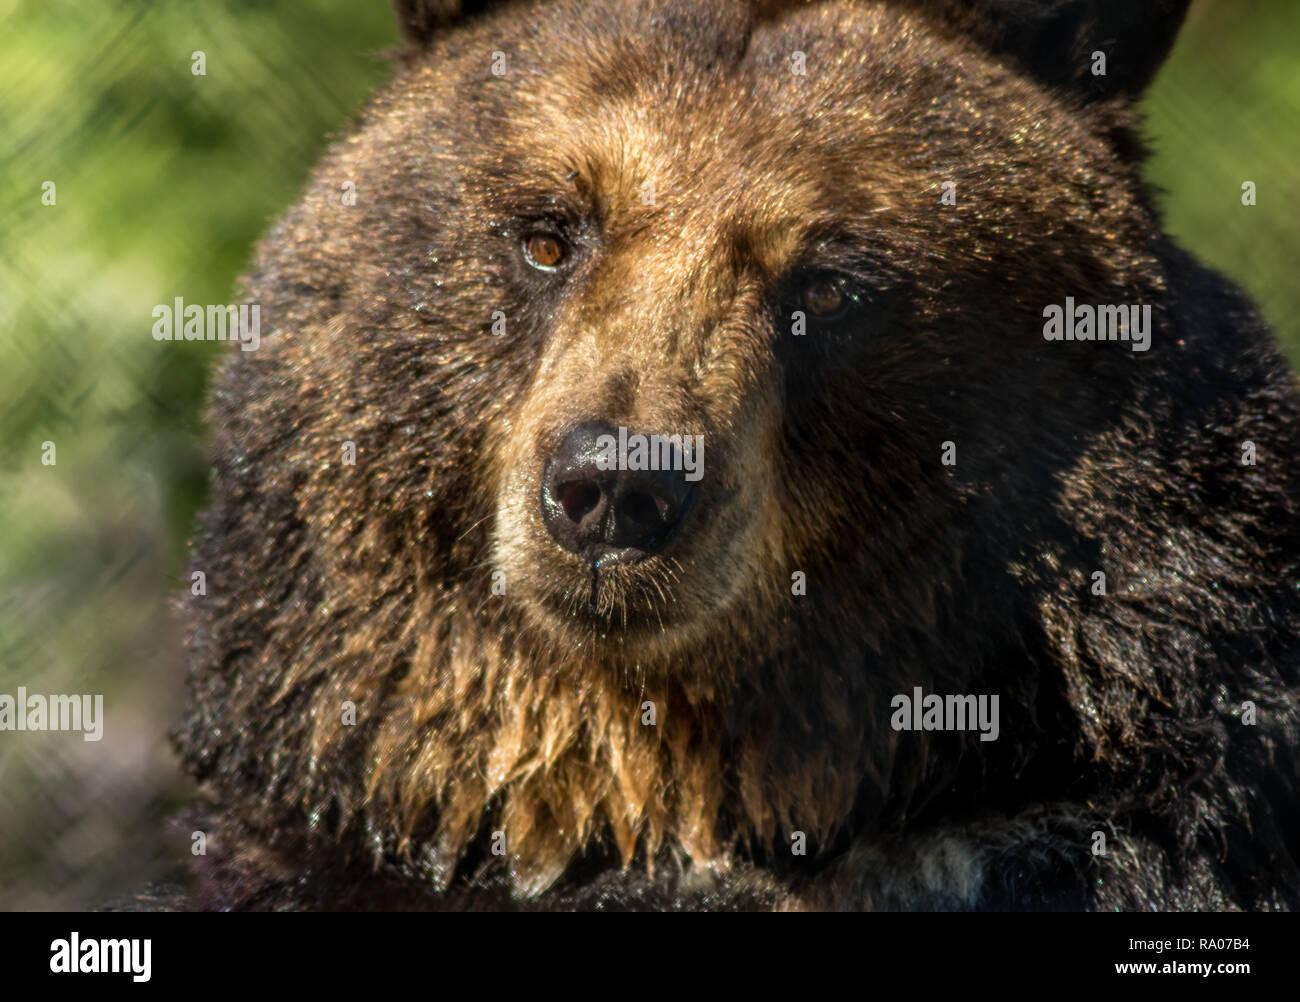 Black bear closeup makes funny facial expressions green background.  Bear market dreadfulness.  Not optimistic.  Crazy times. - Stock Image